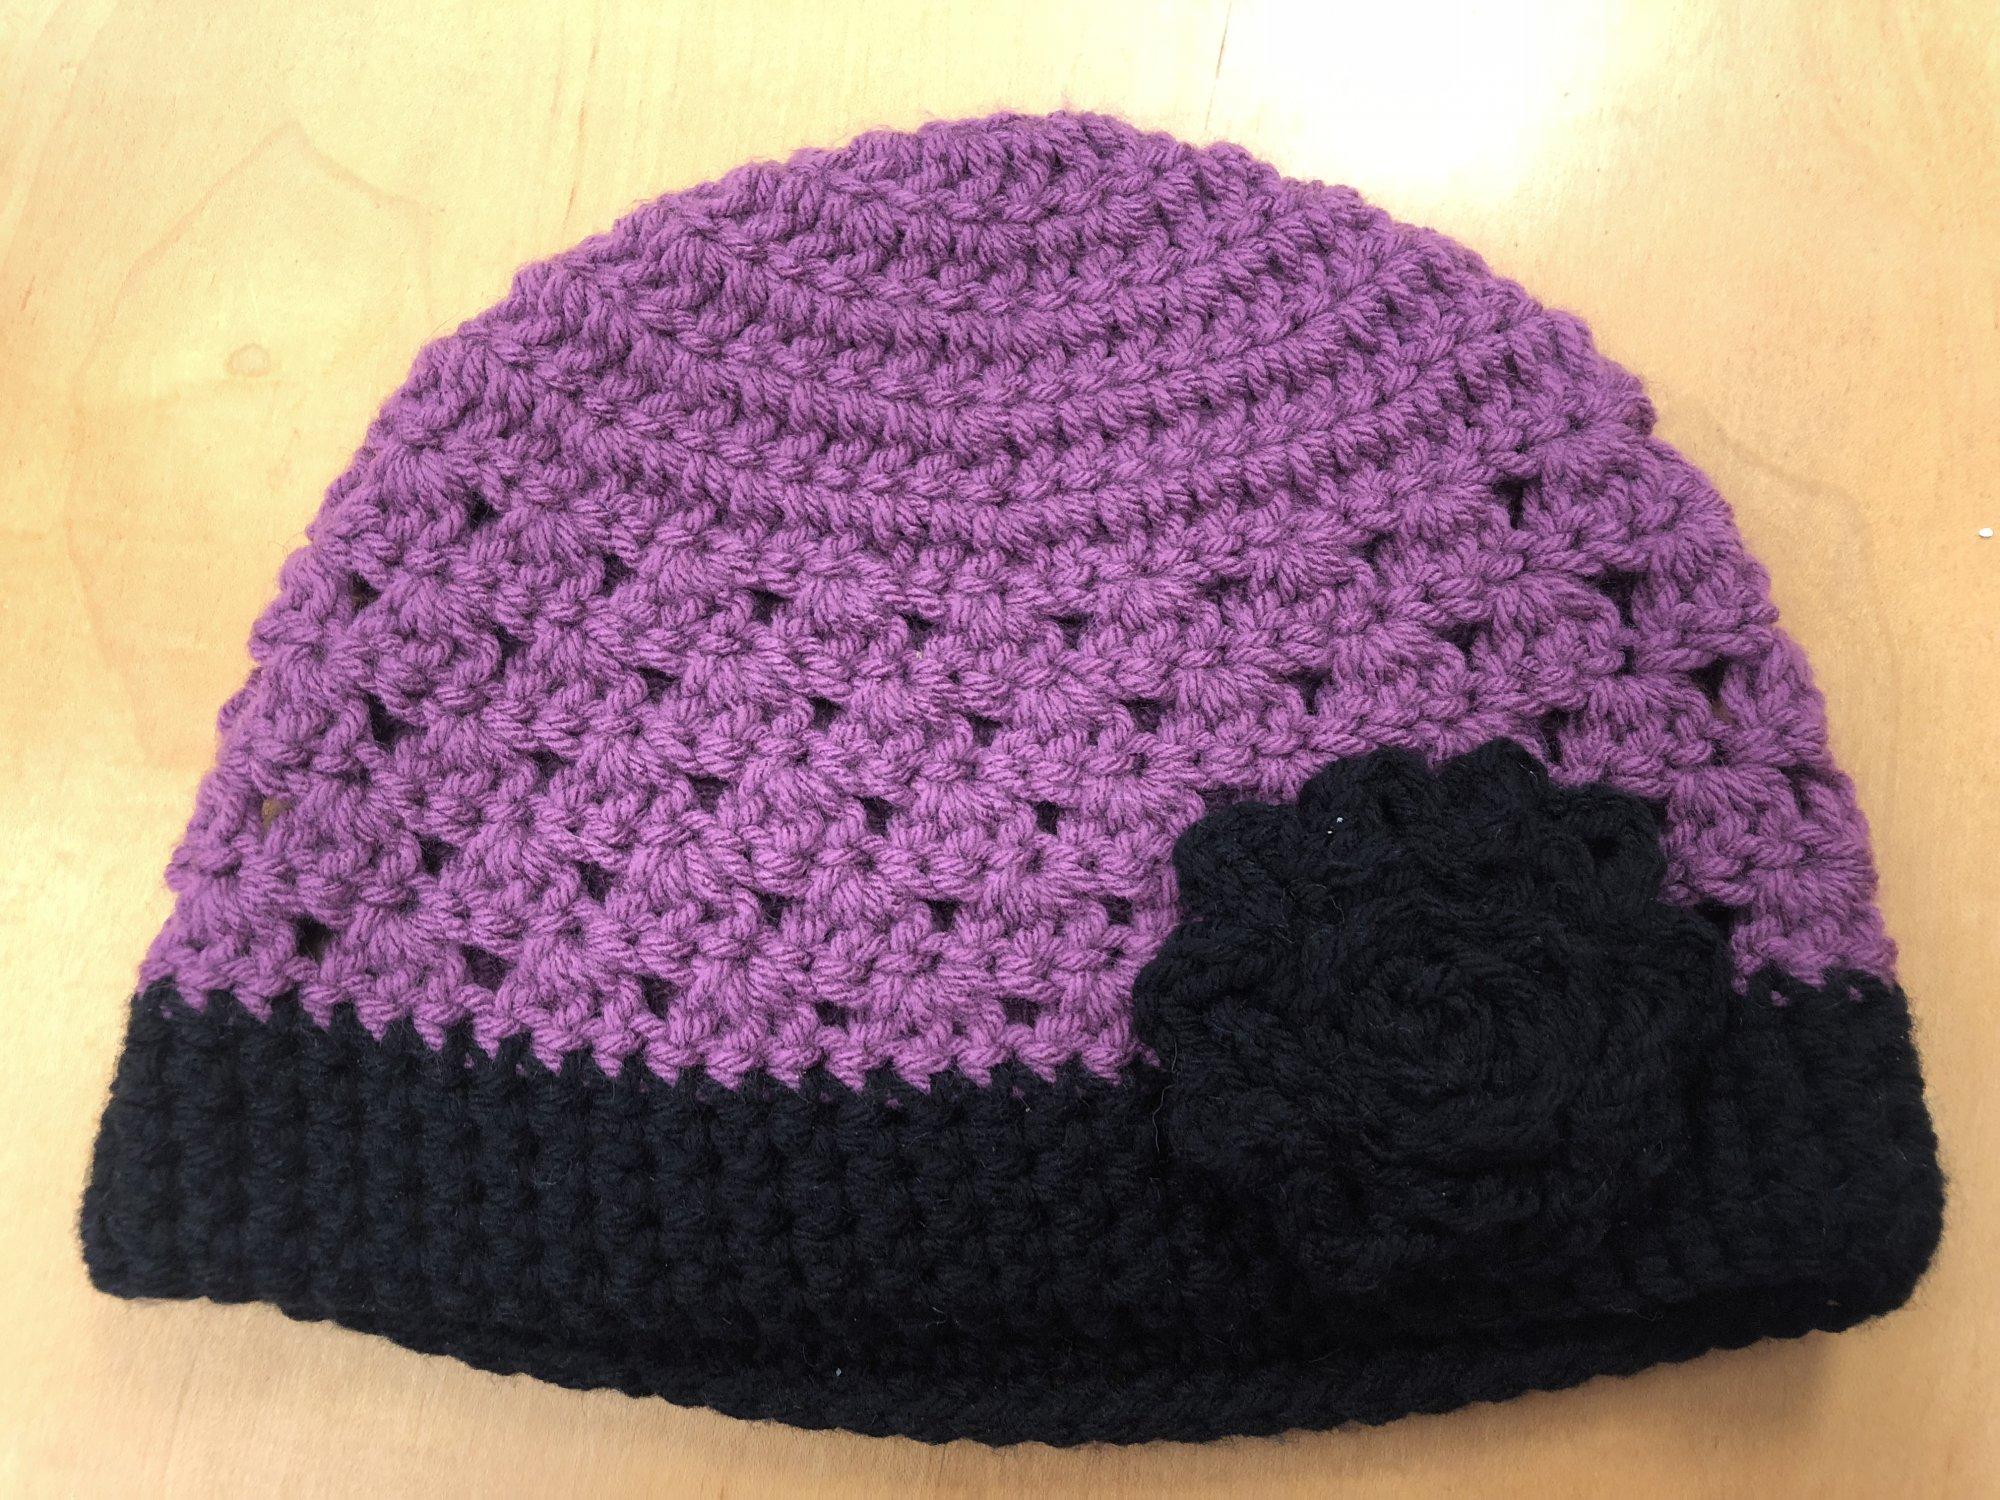 Crocheted Woman's Hat